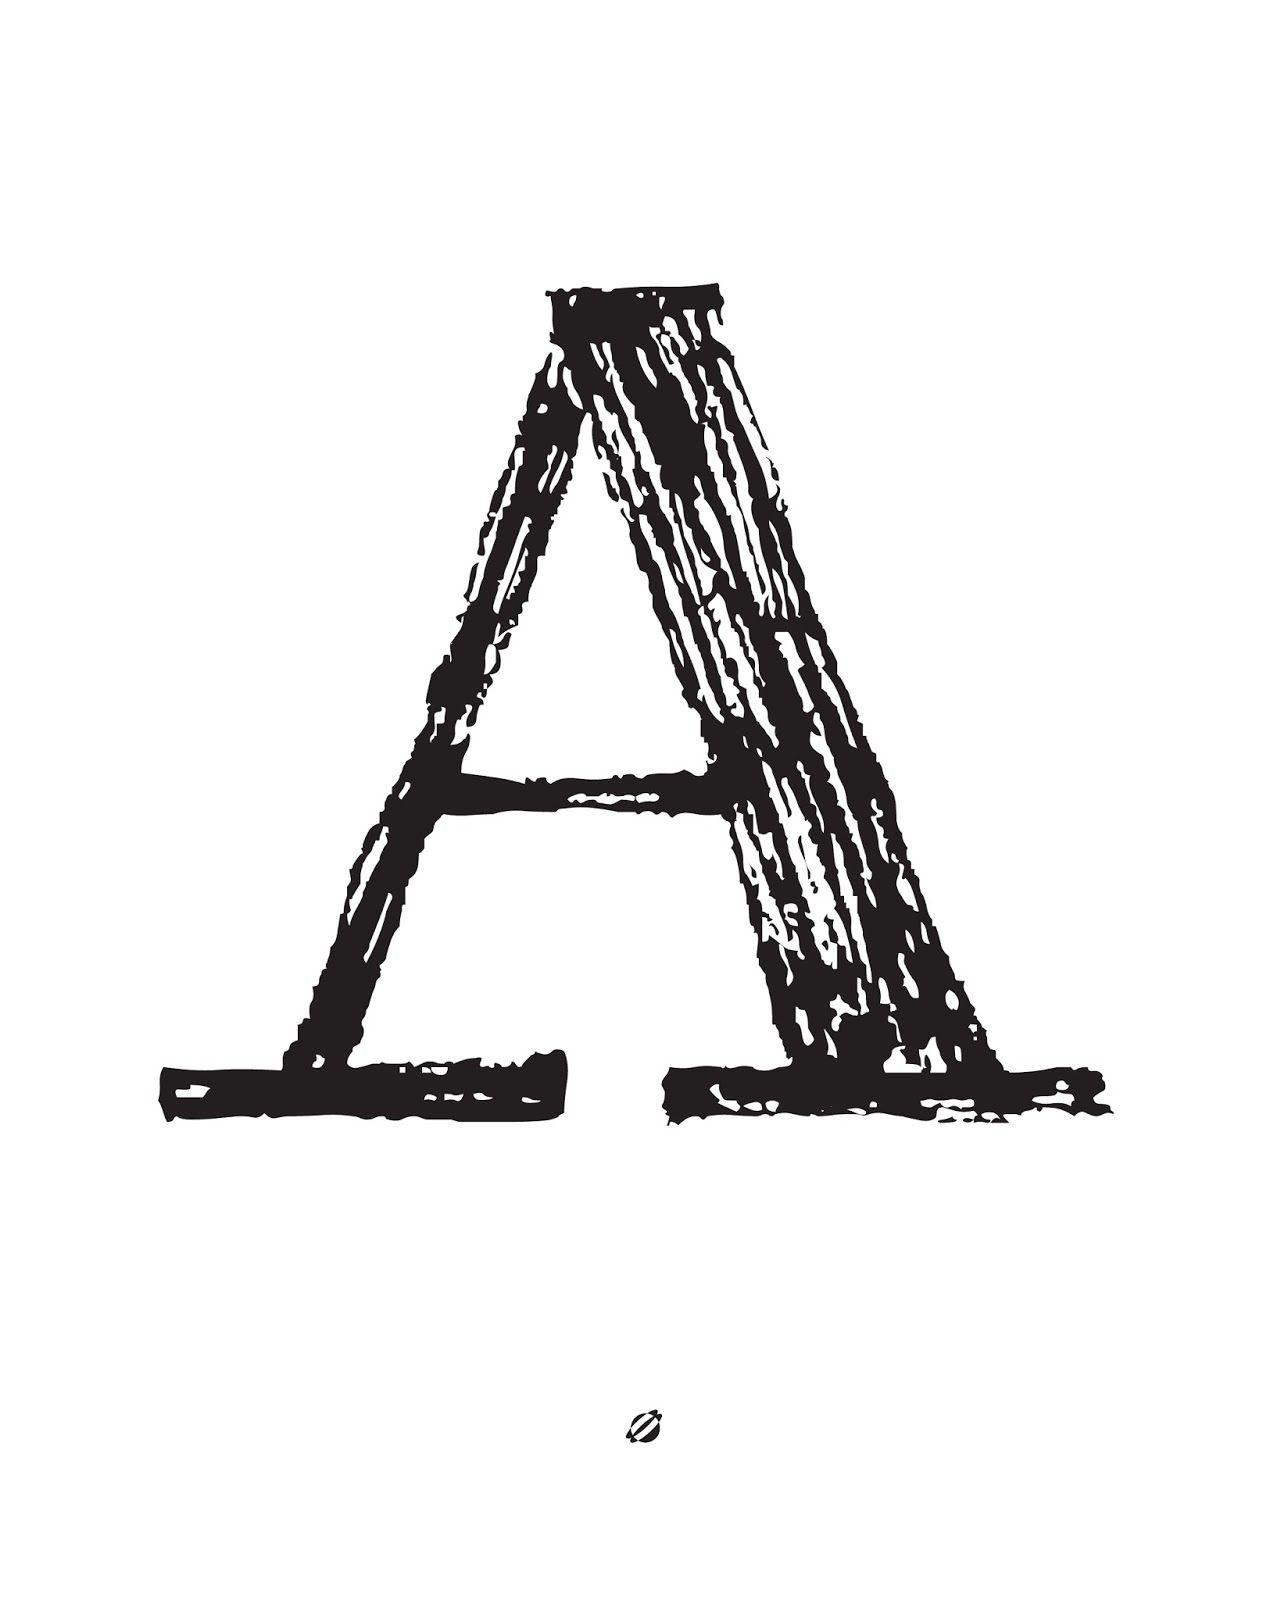 Free Printable Alphabet Letters (A-Z!) // Lostbumblebee   Printables - Free Printable Letters Az